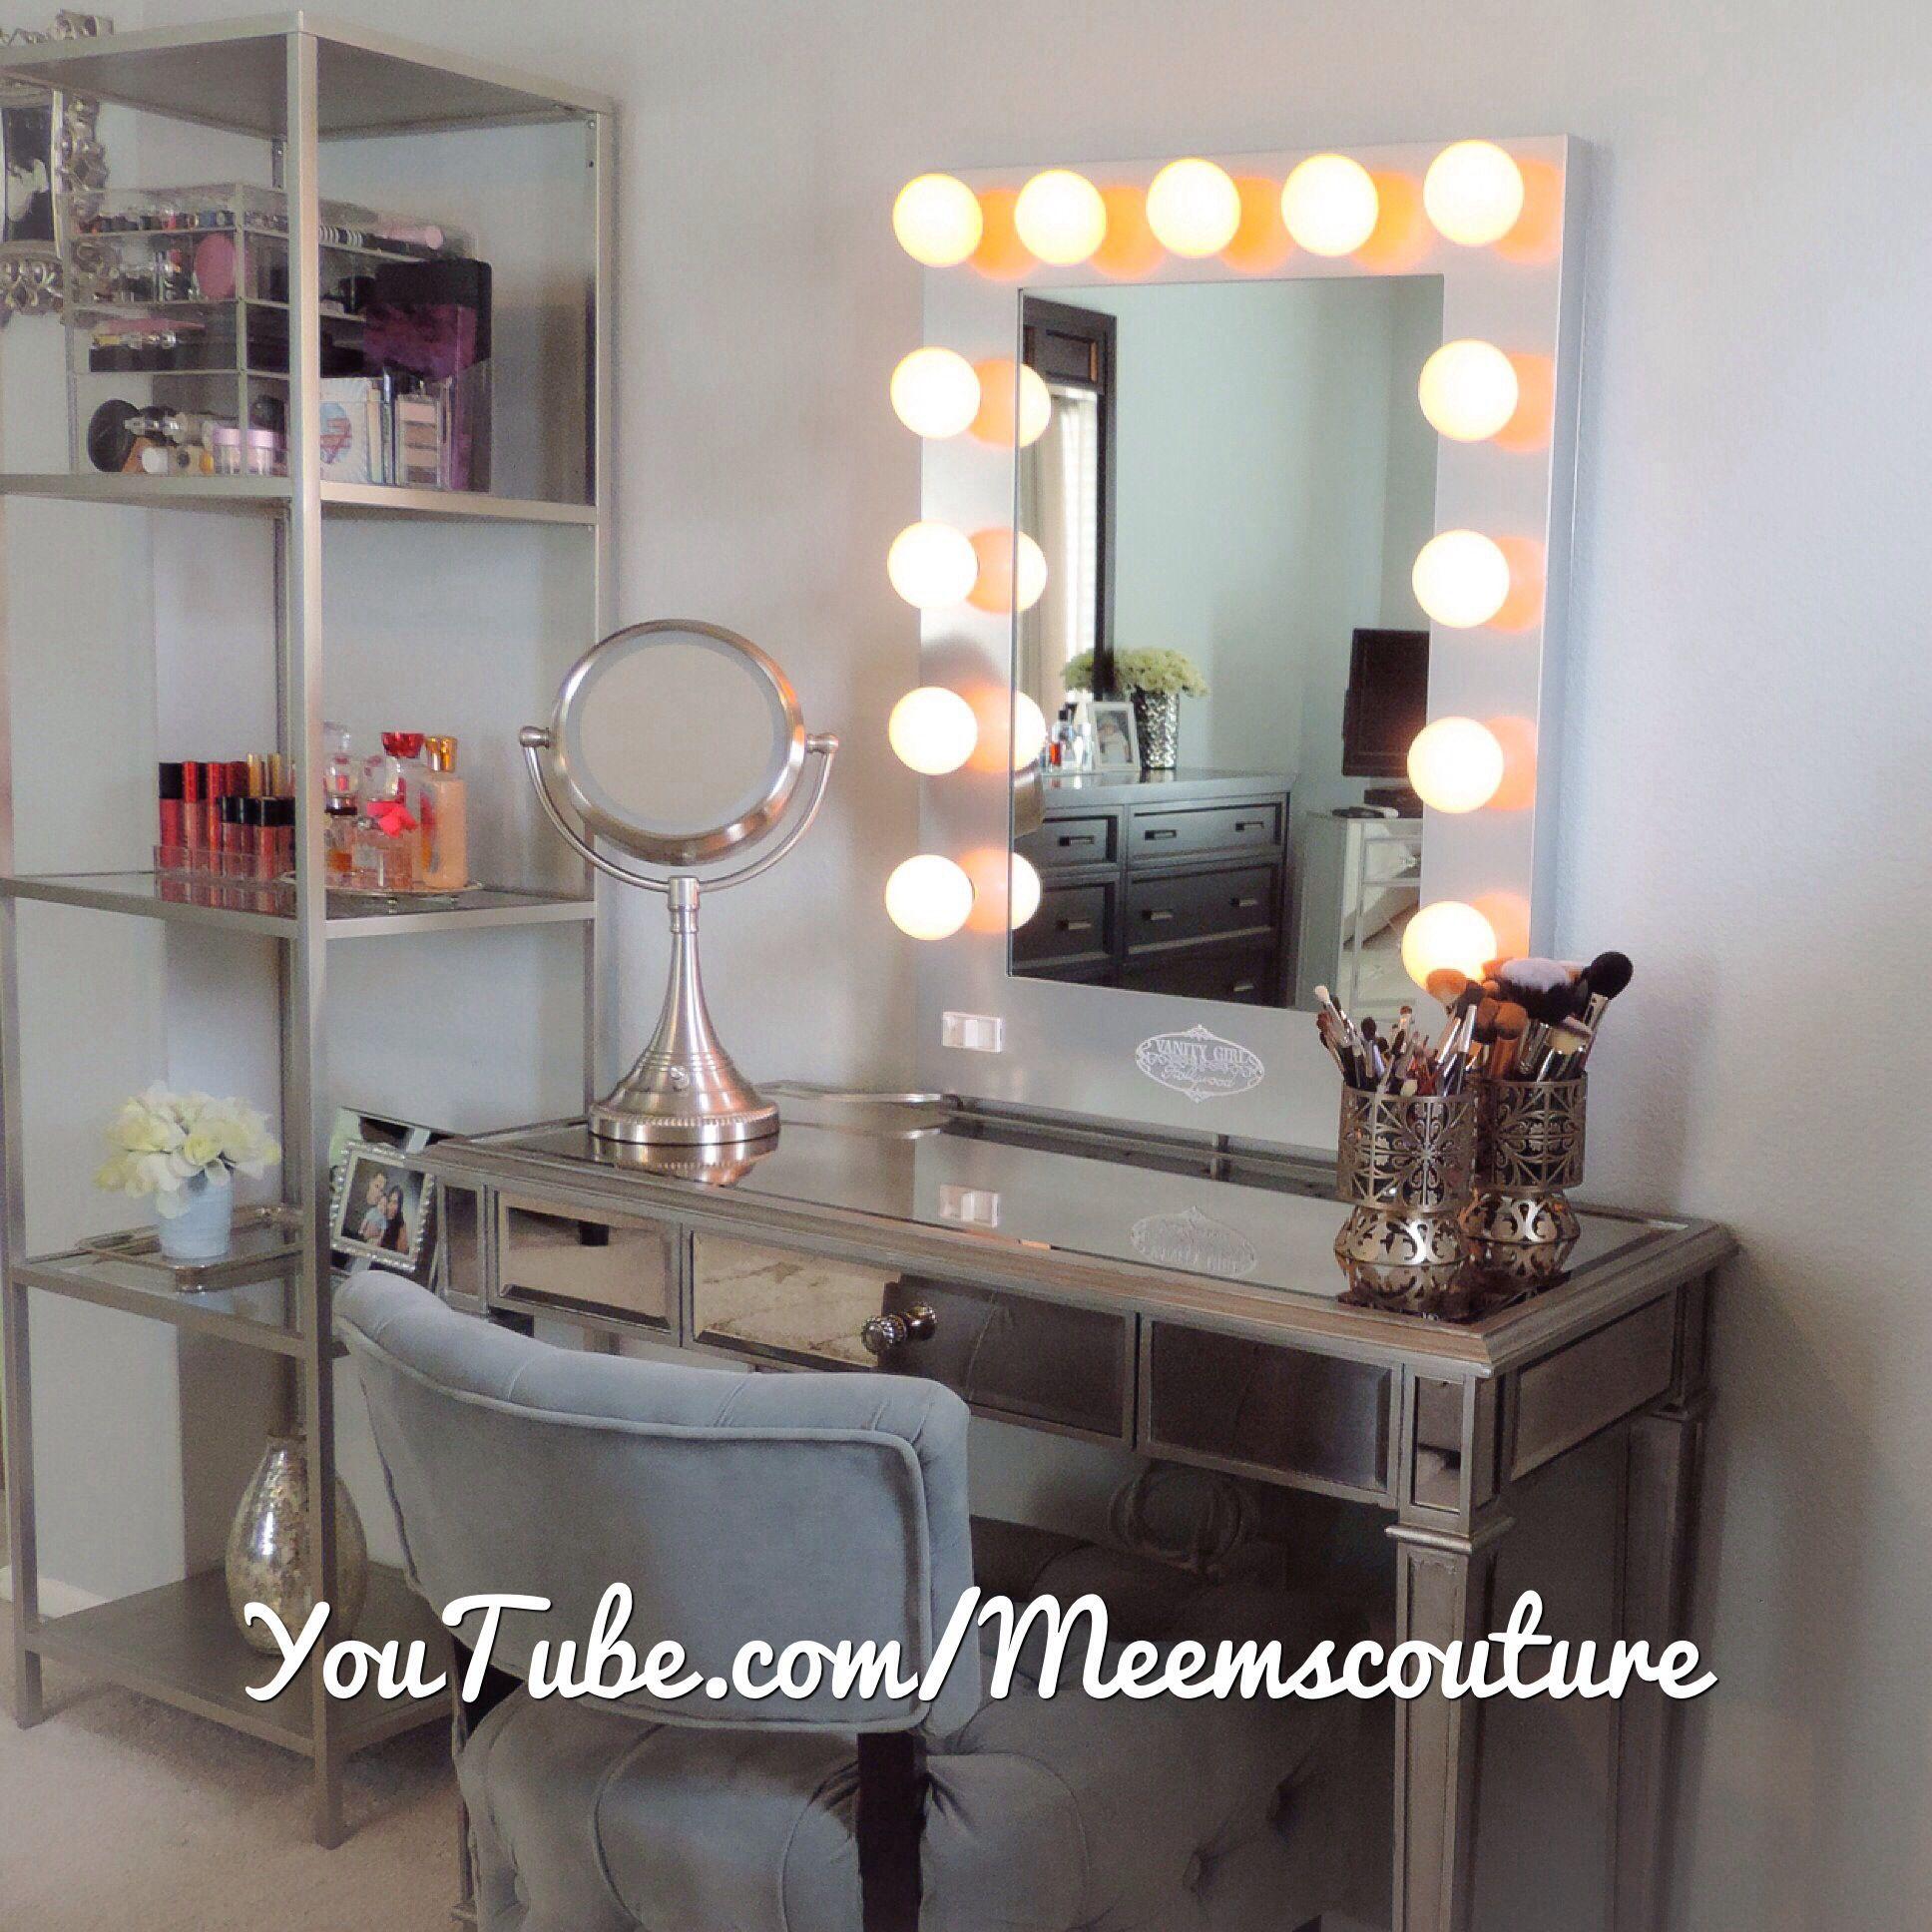 Vanity girl hollywood silver broadway mirror with Hayworth Vanity